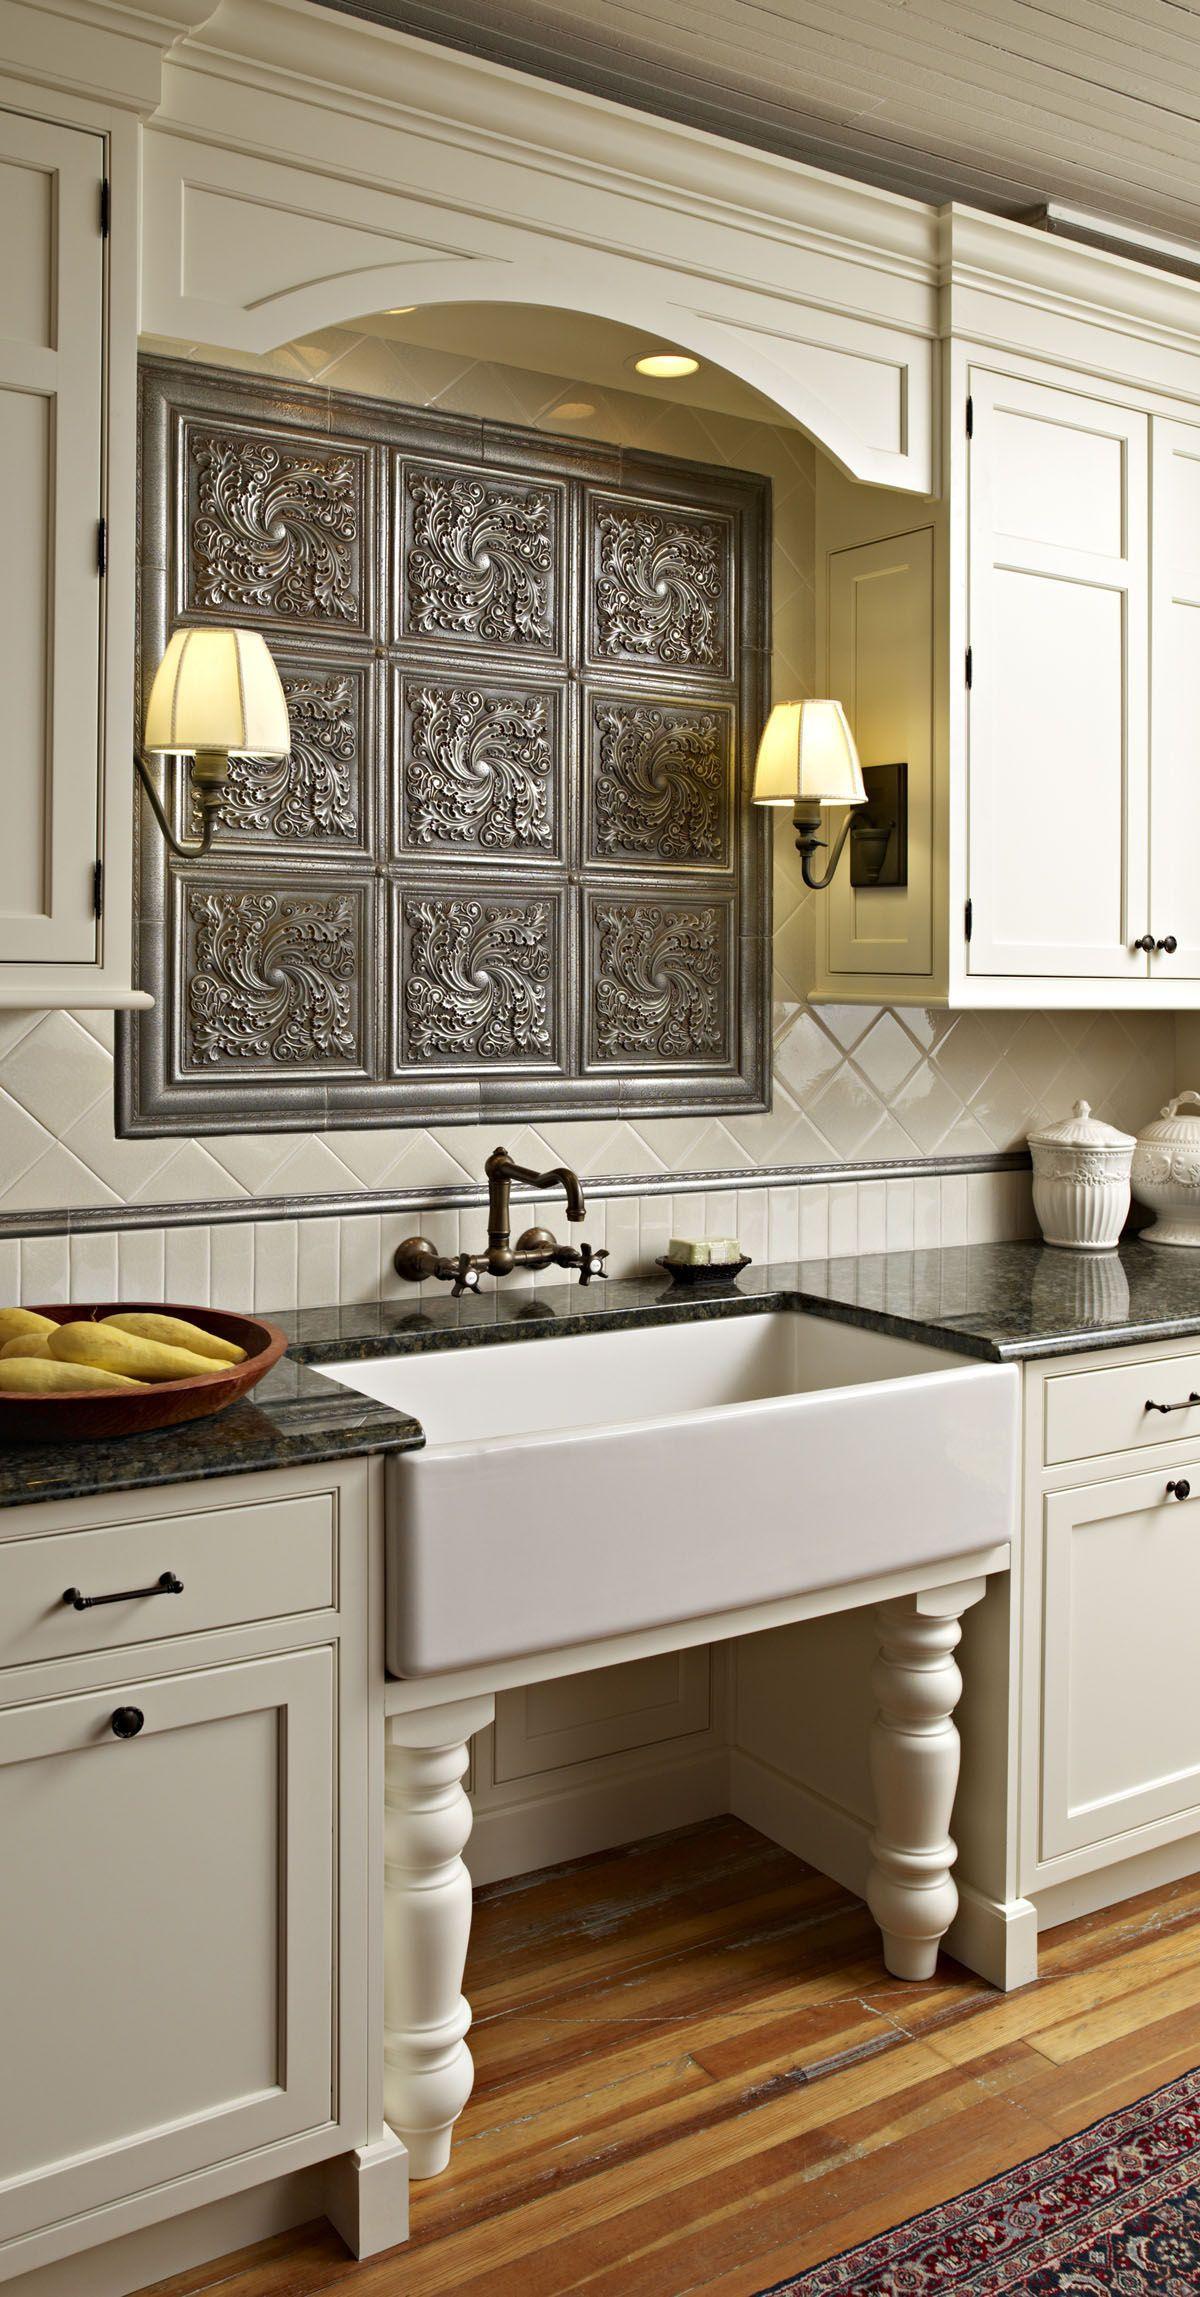 Vintage Style Kitchen With A Cool Backsplash Farmhouse Sink Delectable Kitchen Sink Backsplash Design Decoration